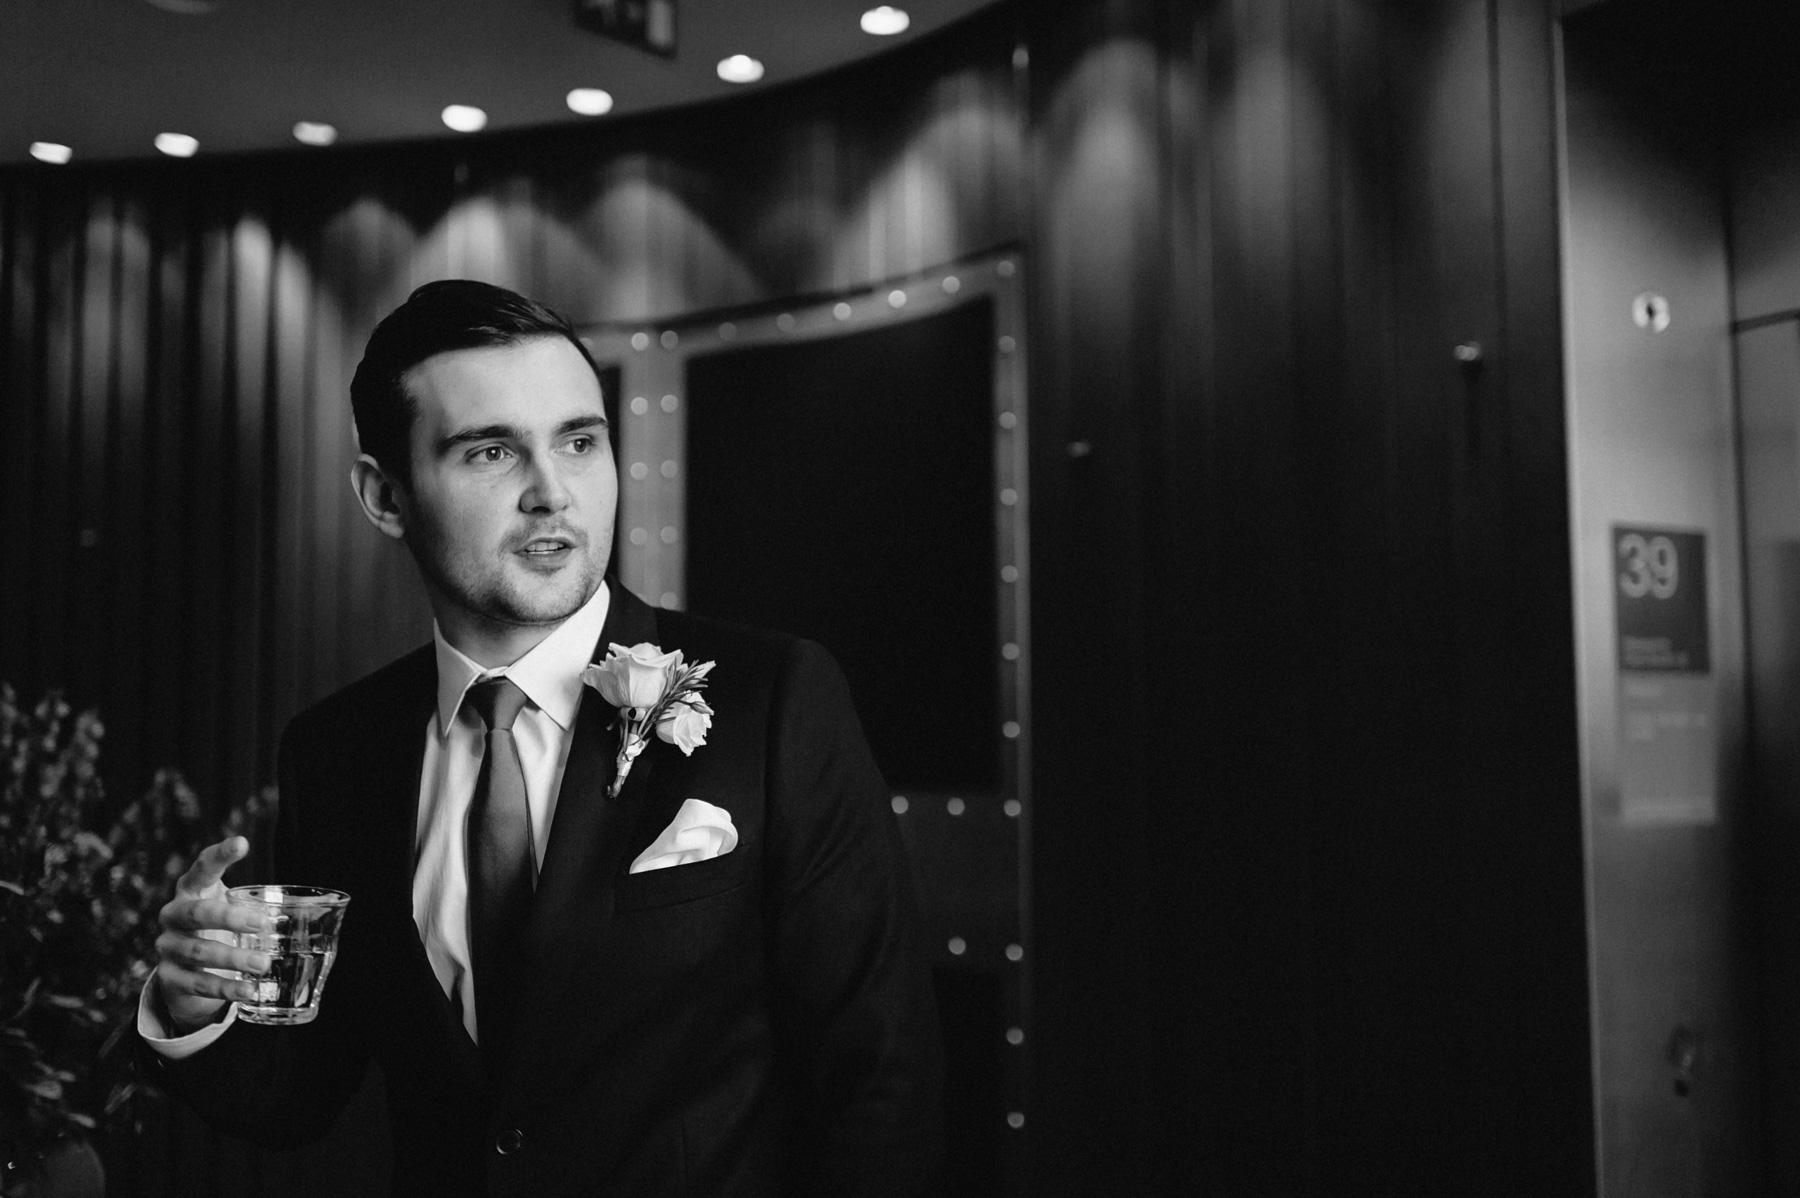 the groom waits nervously